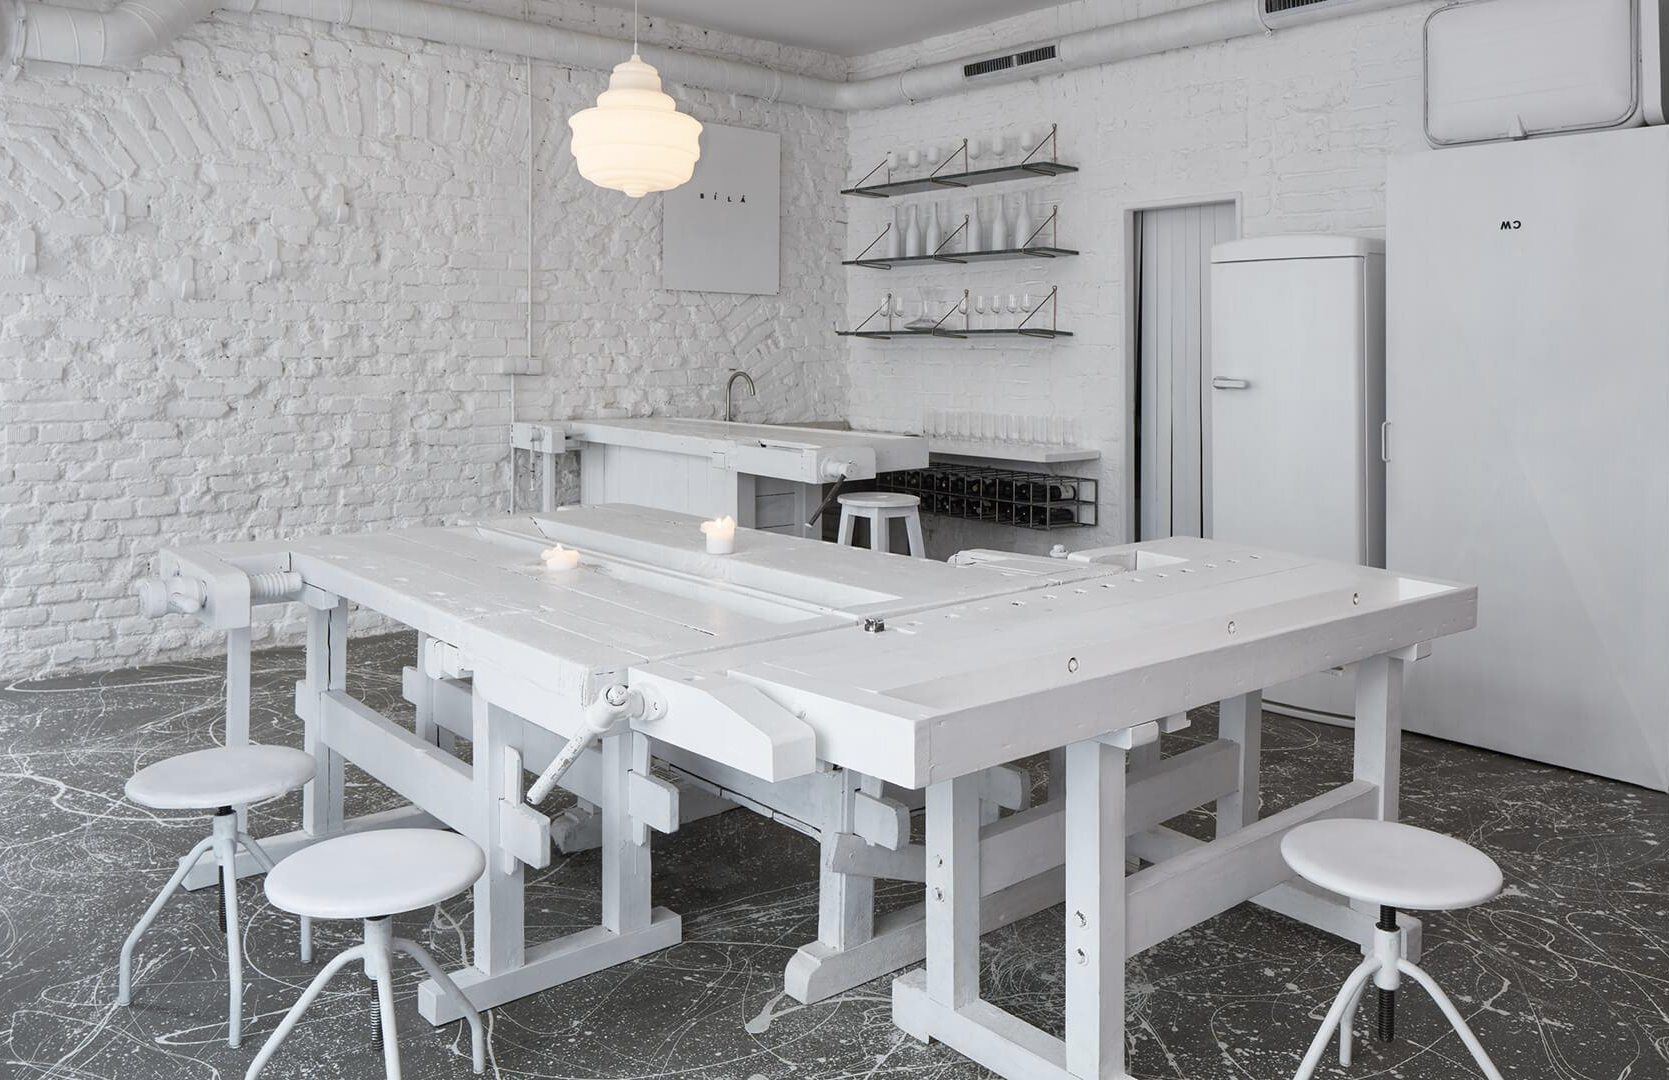 The ultra-minimal interiors of Dvojka bar in Prague